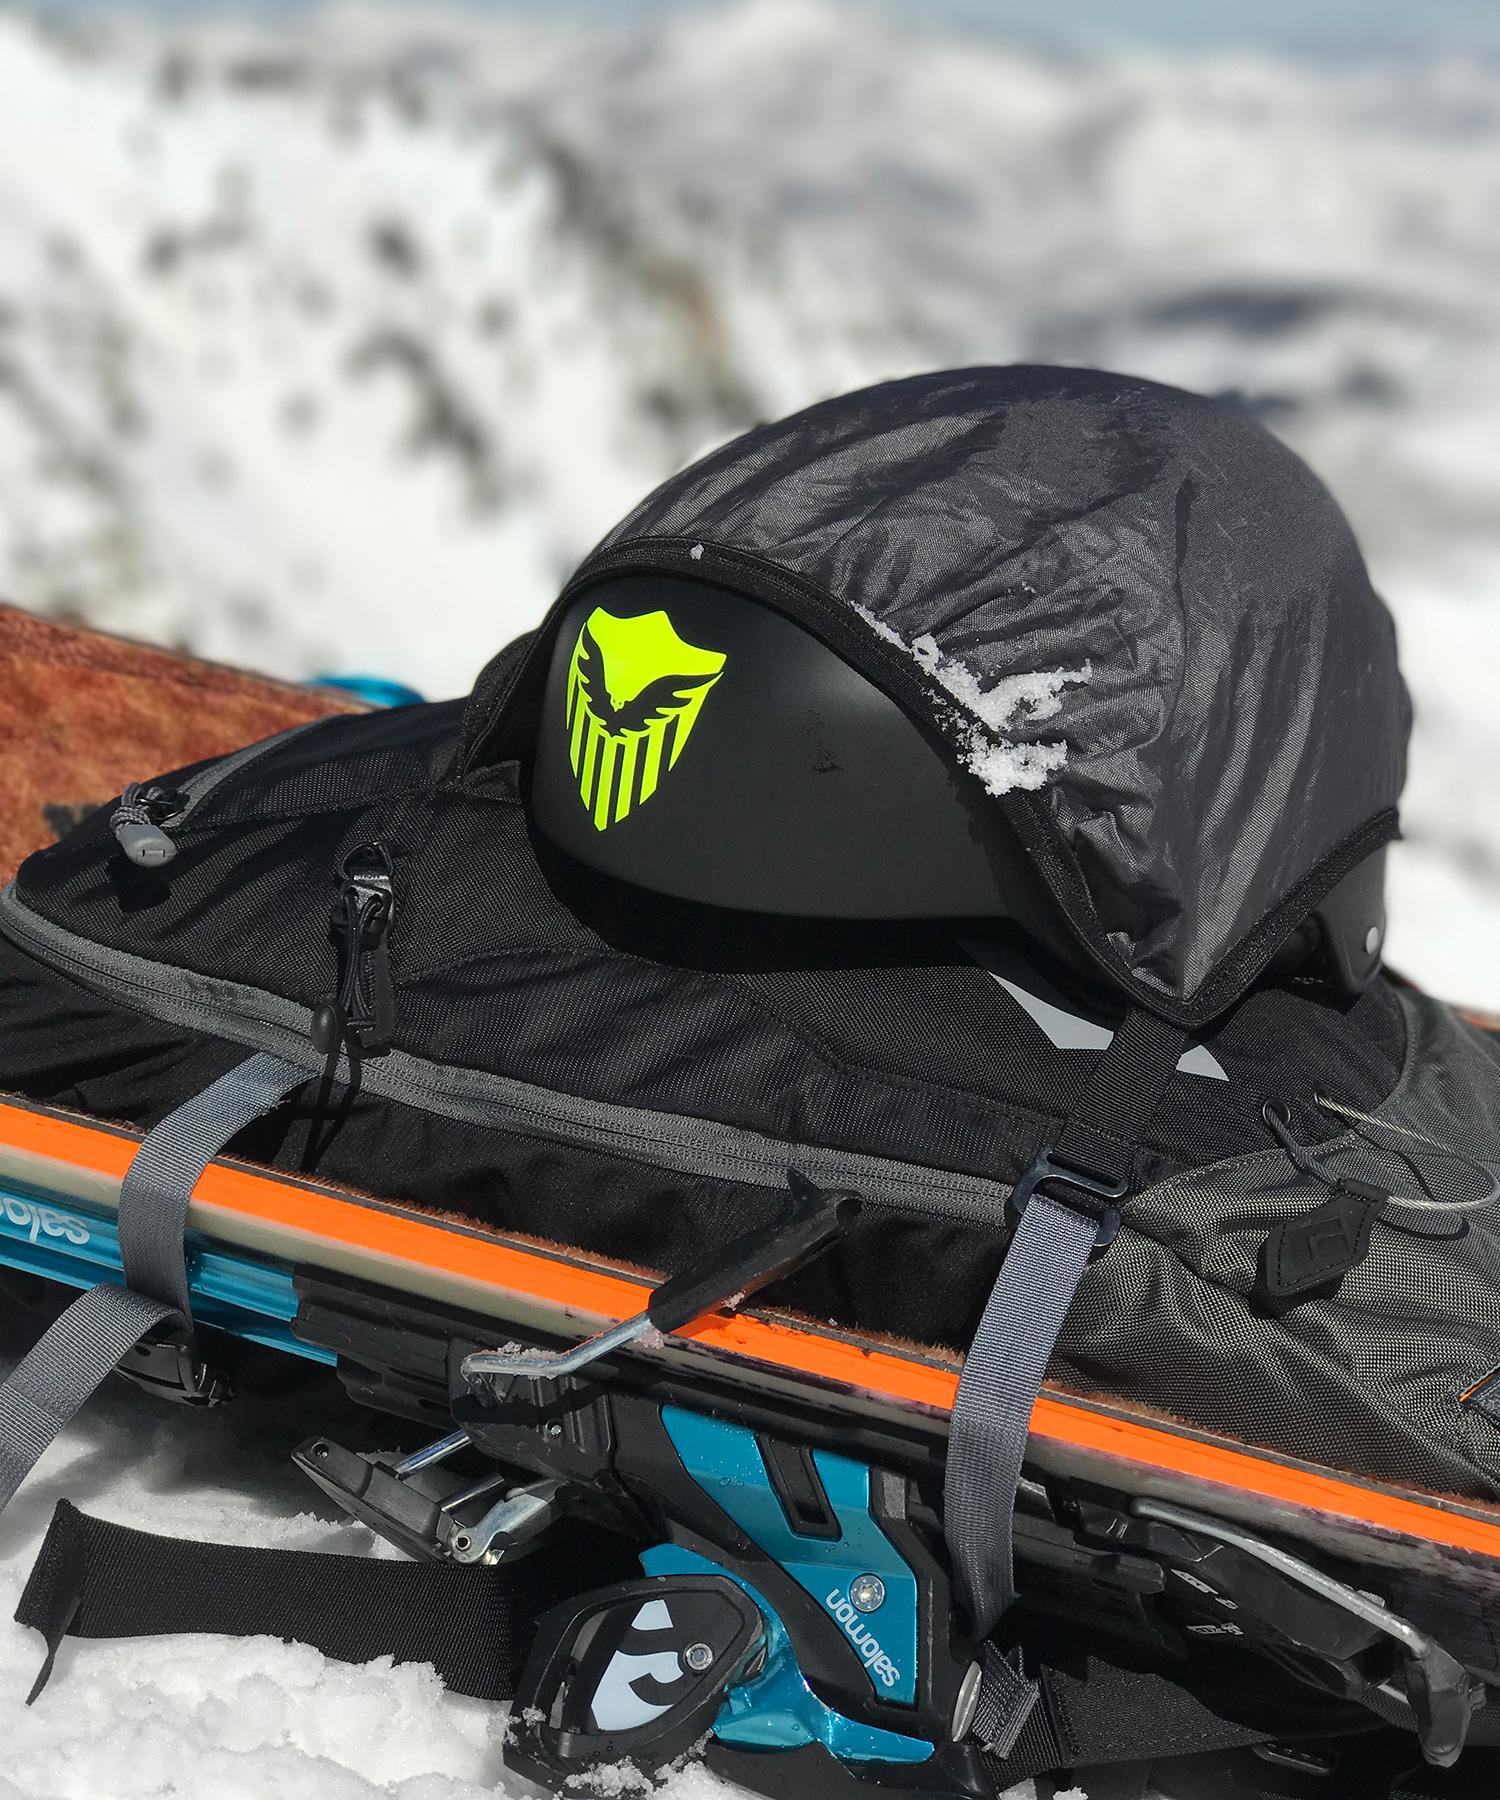 backcountry-ski-backpack-blackdiamond-picture.jpg